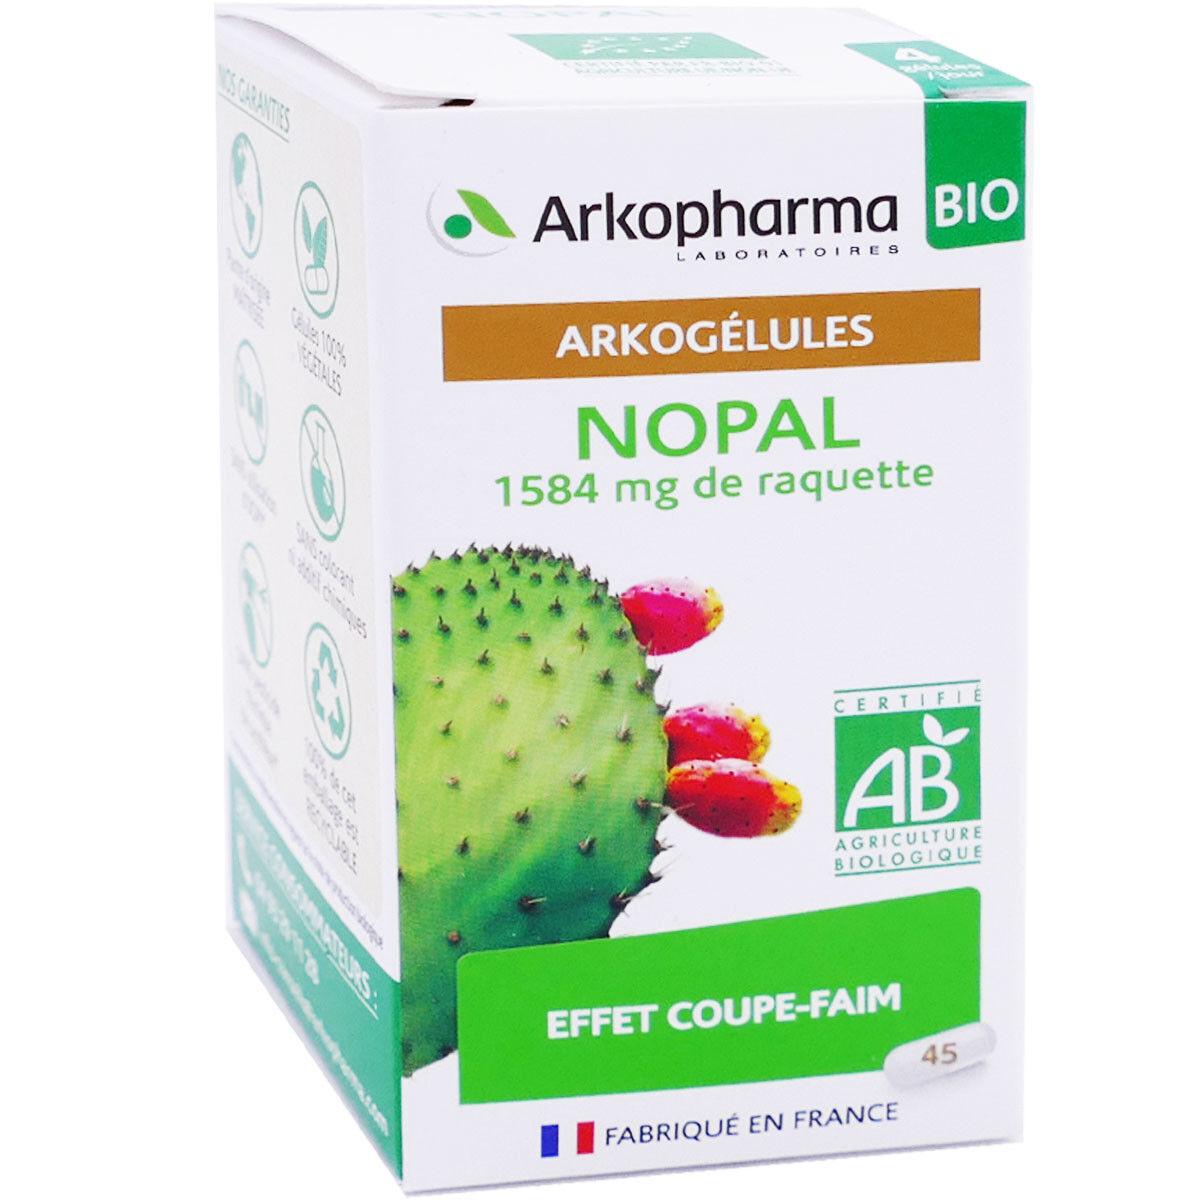 Arkopharma nopal coupe faim 45 arkogelules